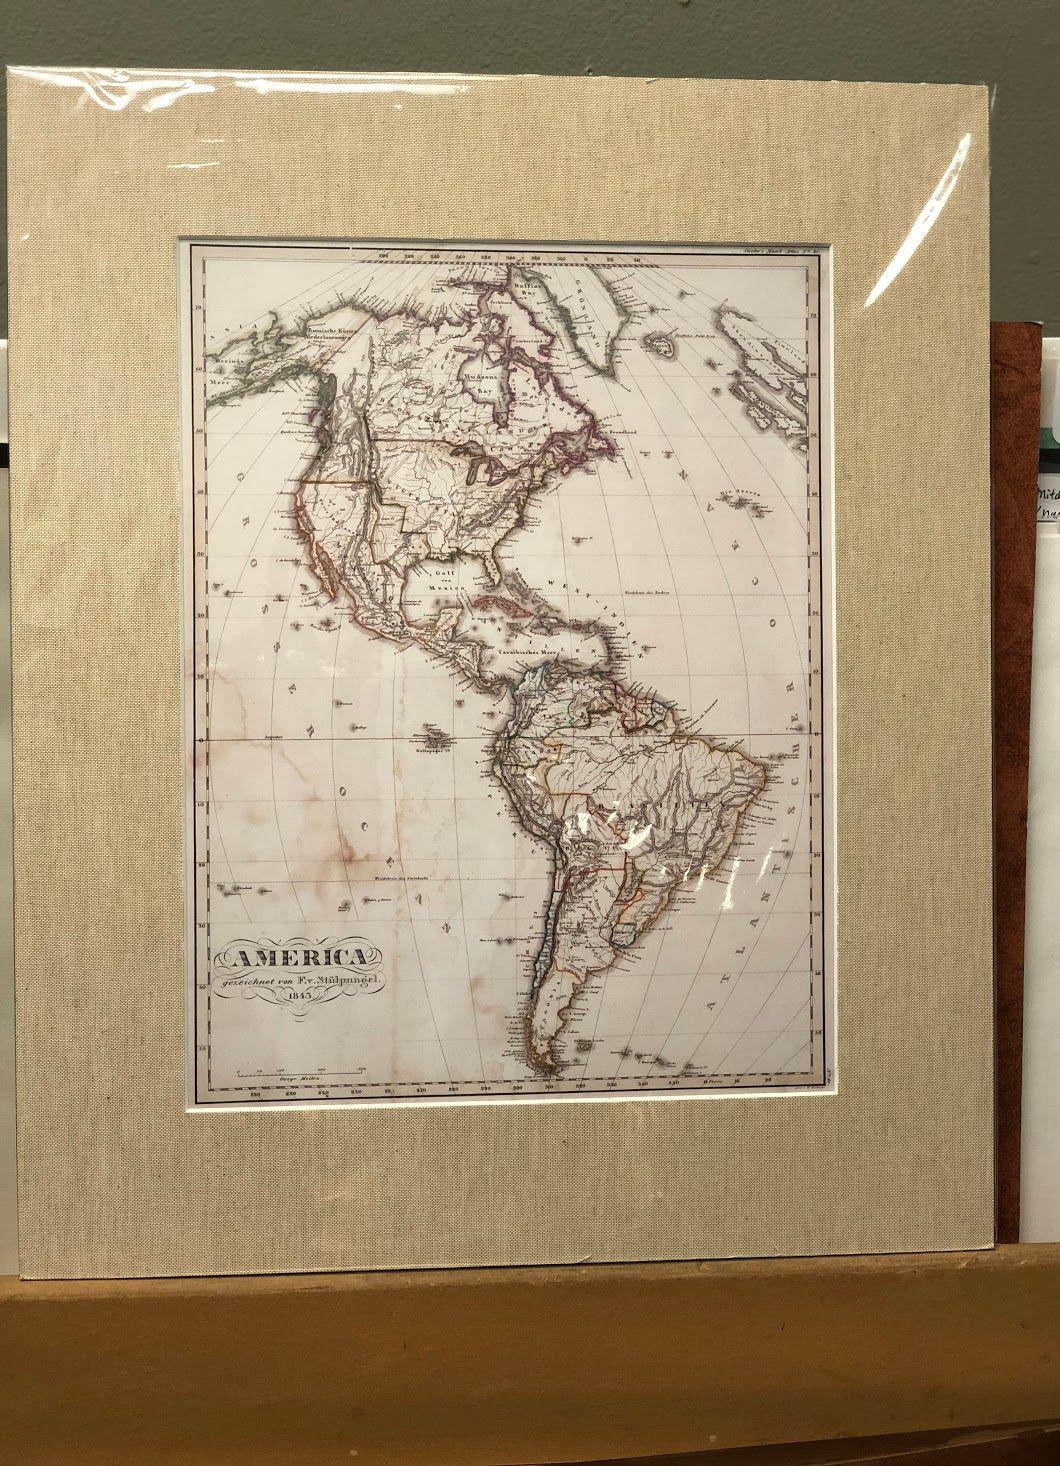 America Map Ready For Framing! Bonrics Custom Framing and Gallery ...